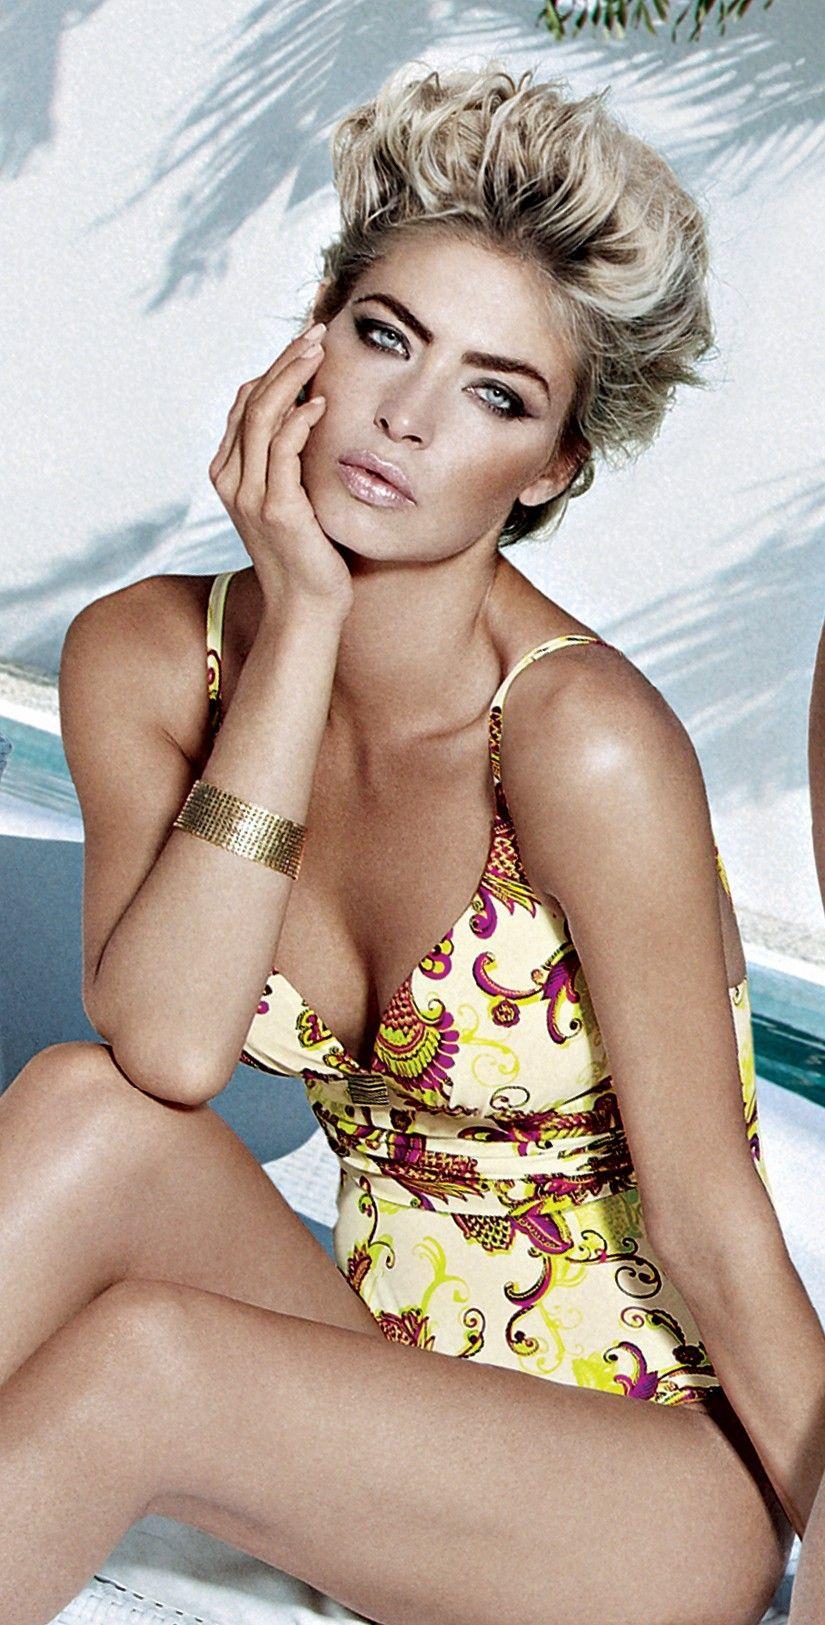 Maryan Mehlhorn 2013 Shangri-La Love yellow Padded Swimsuit.